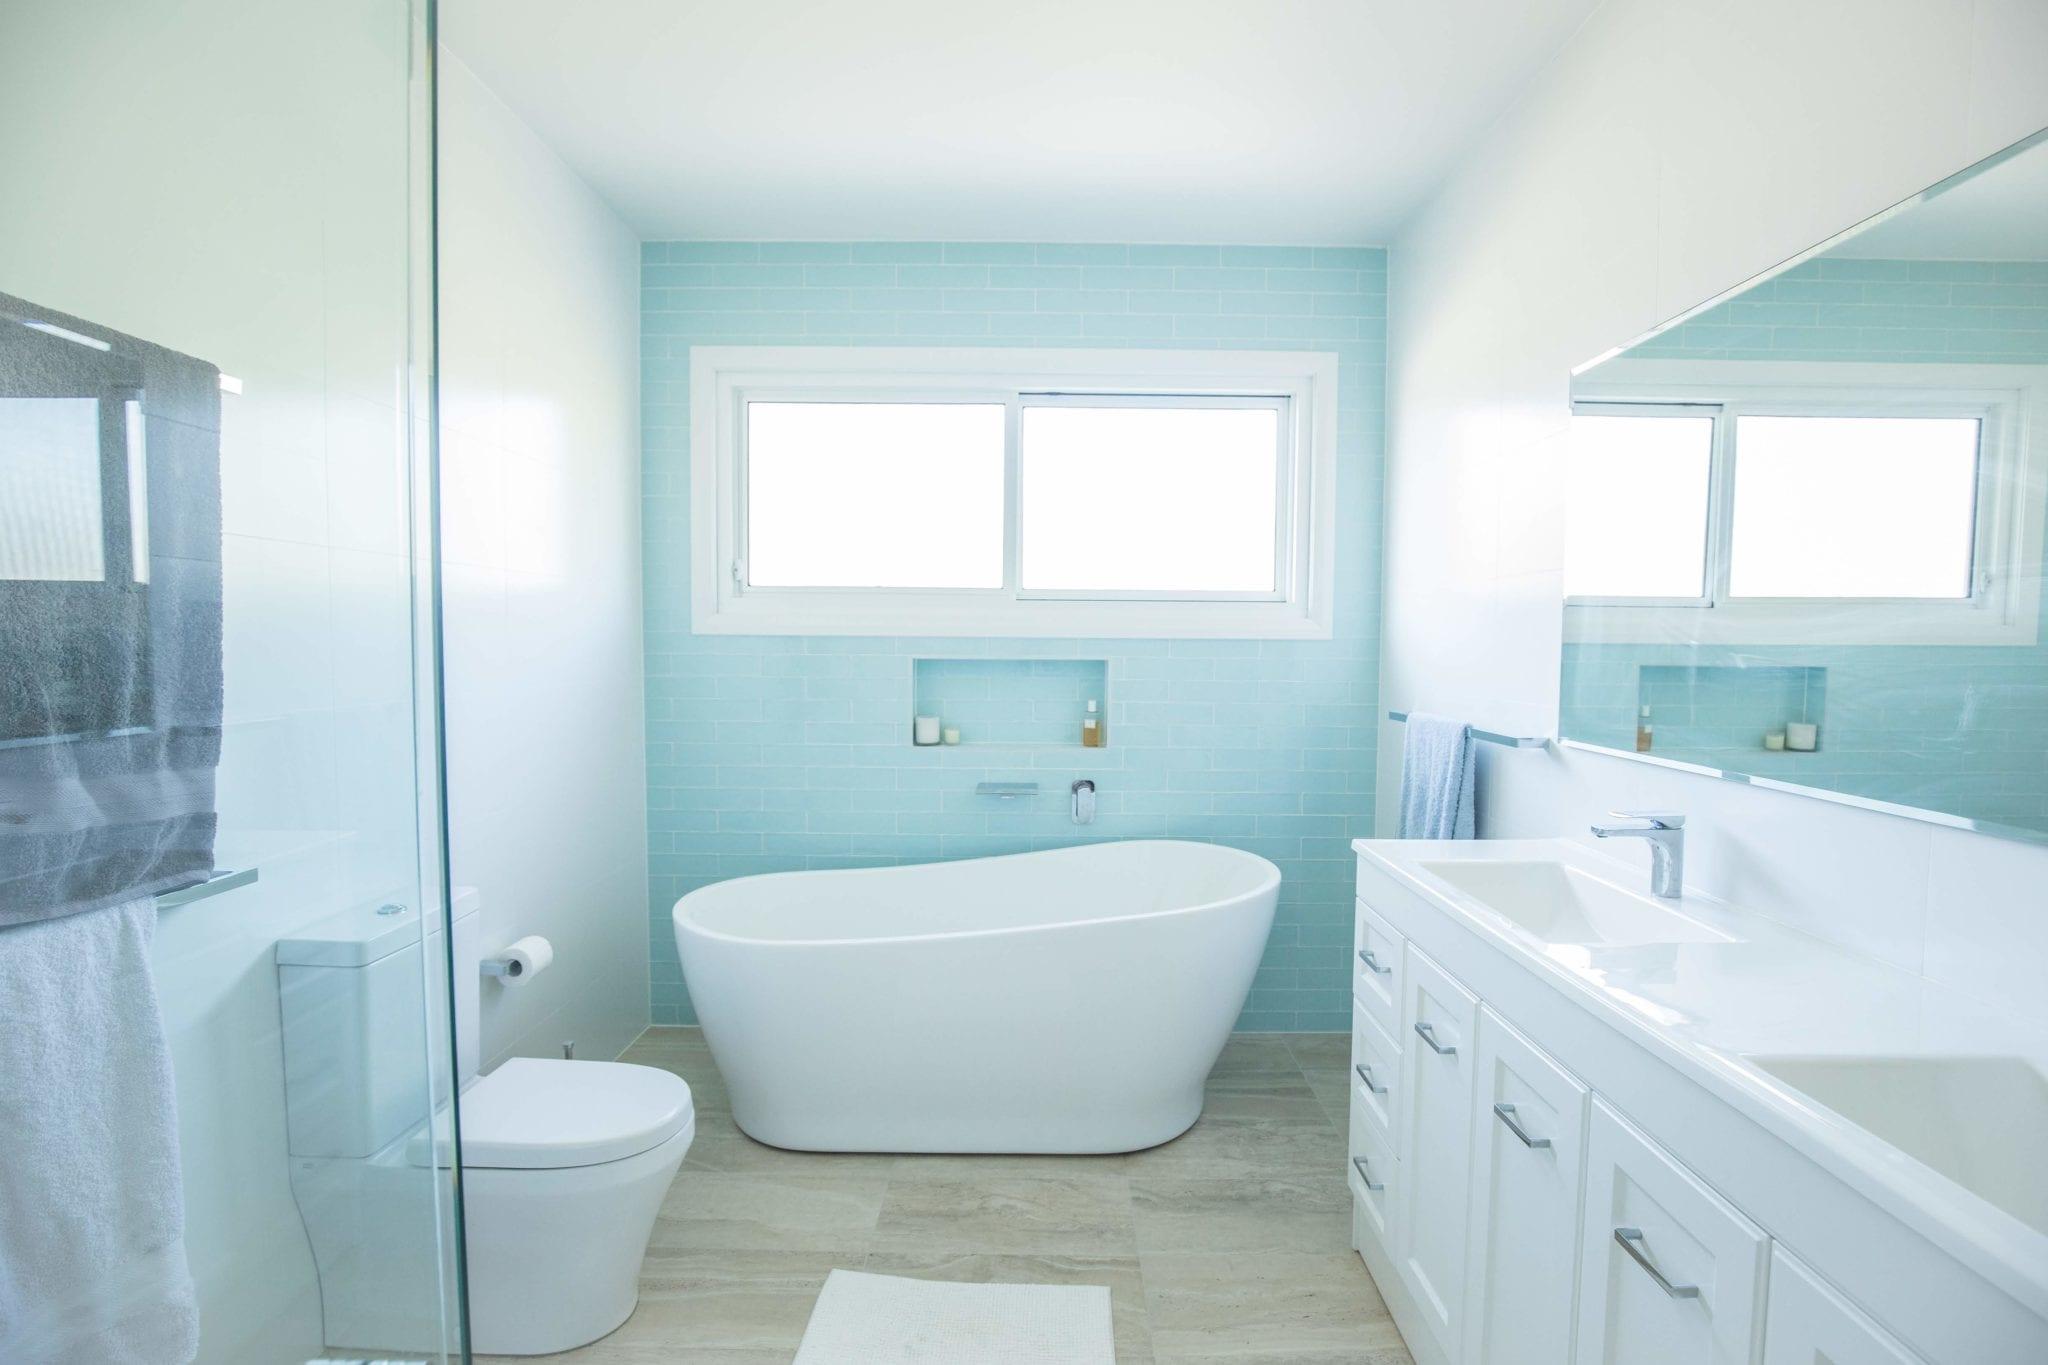 Bathroom Renovations in Turramurra